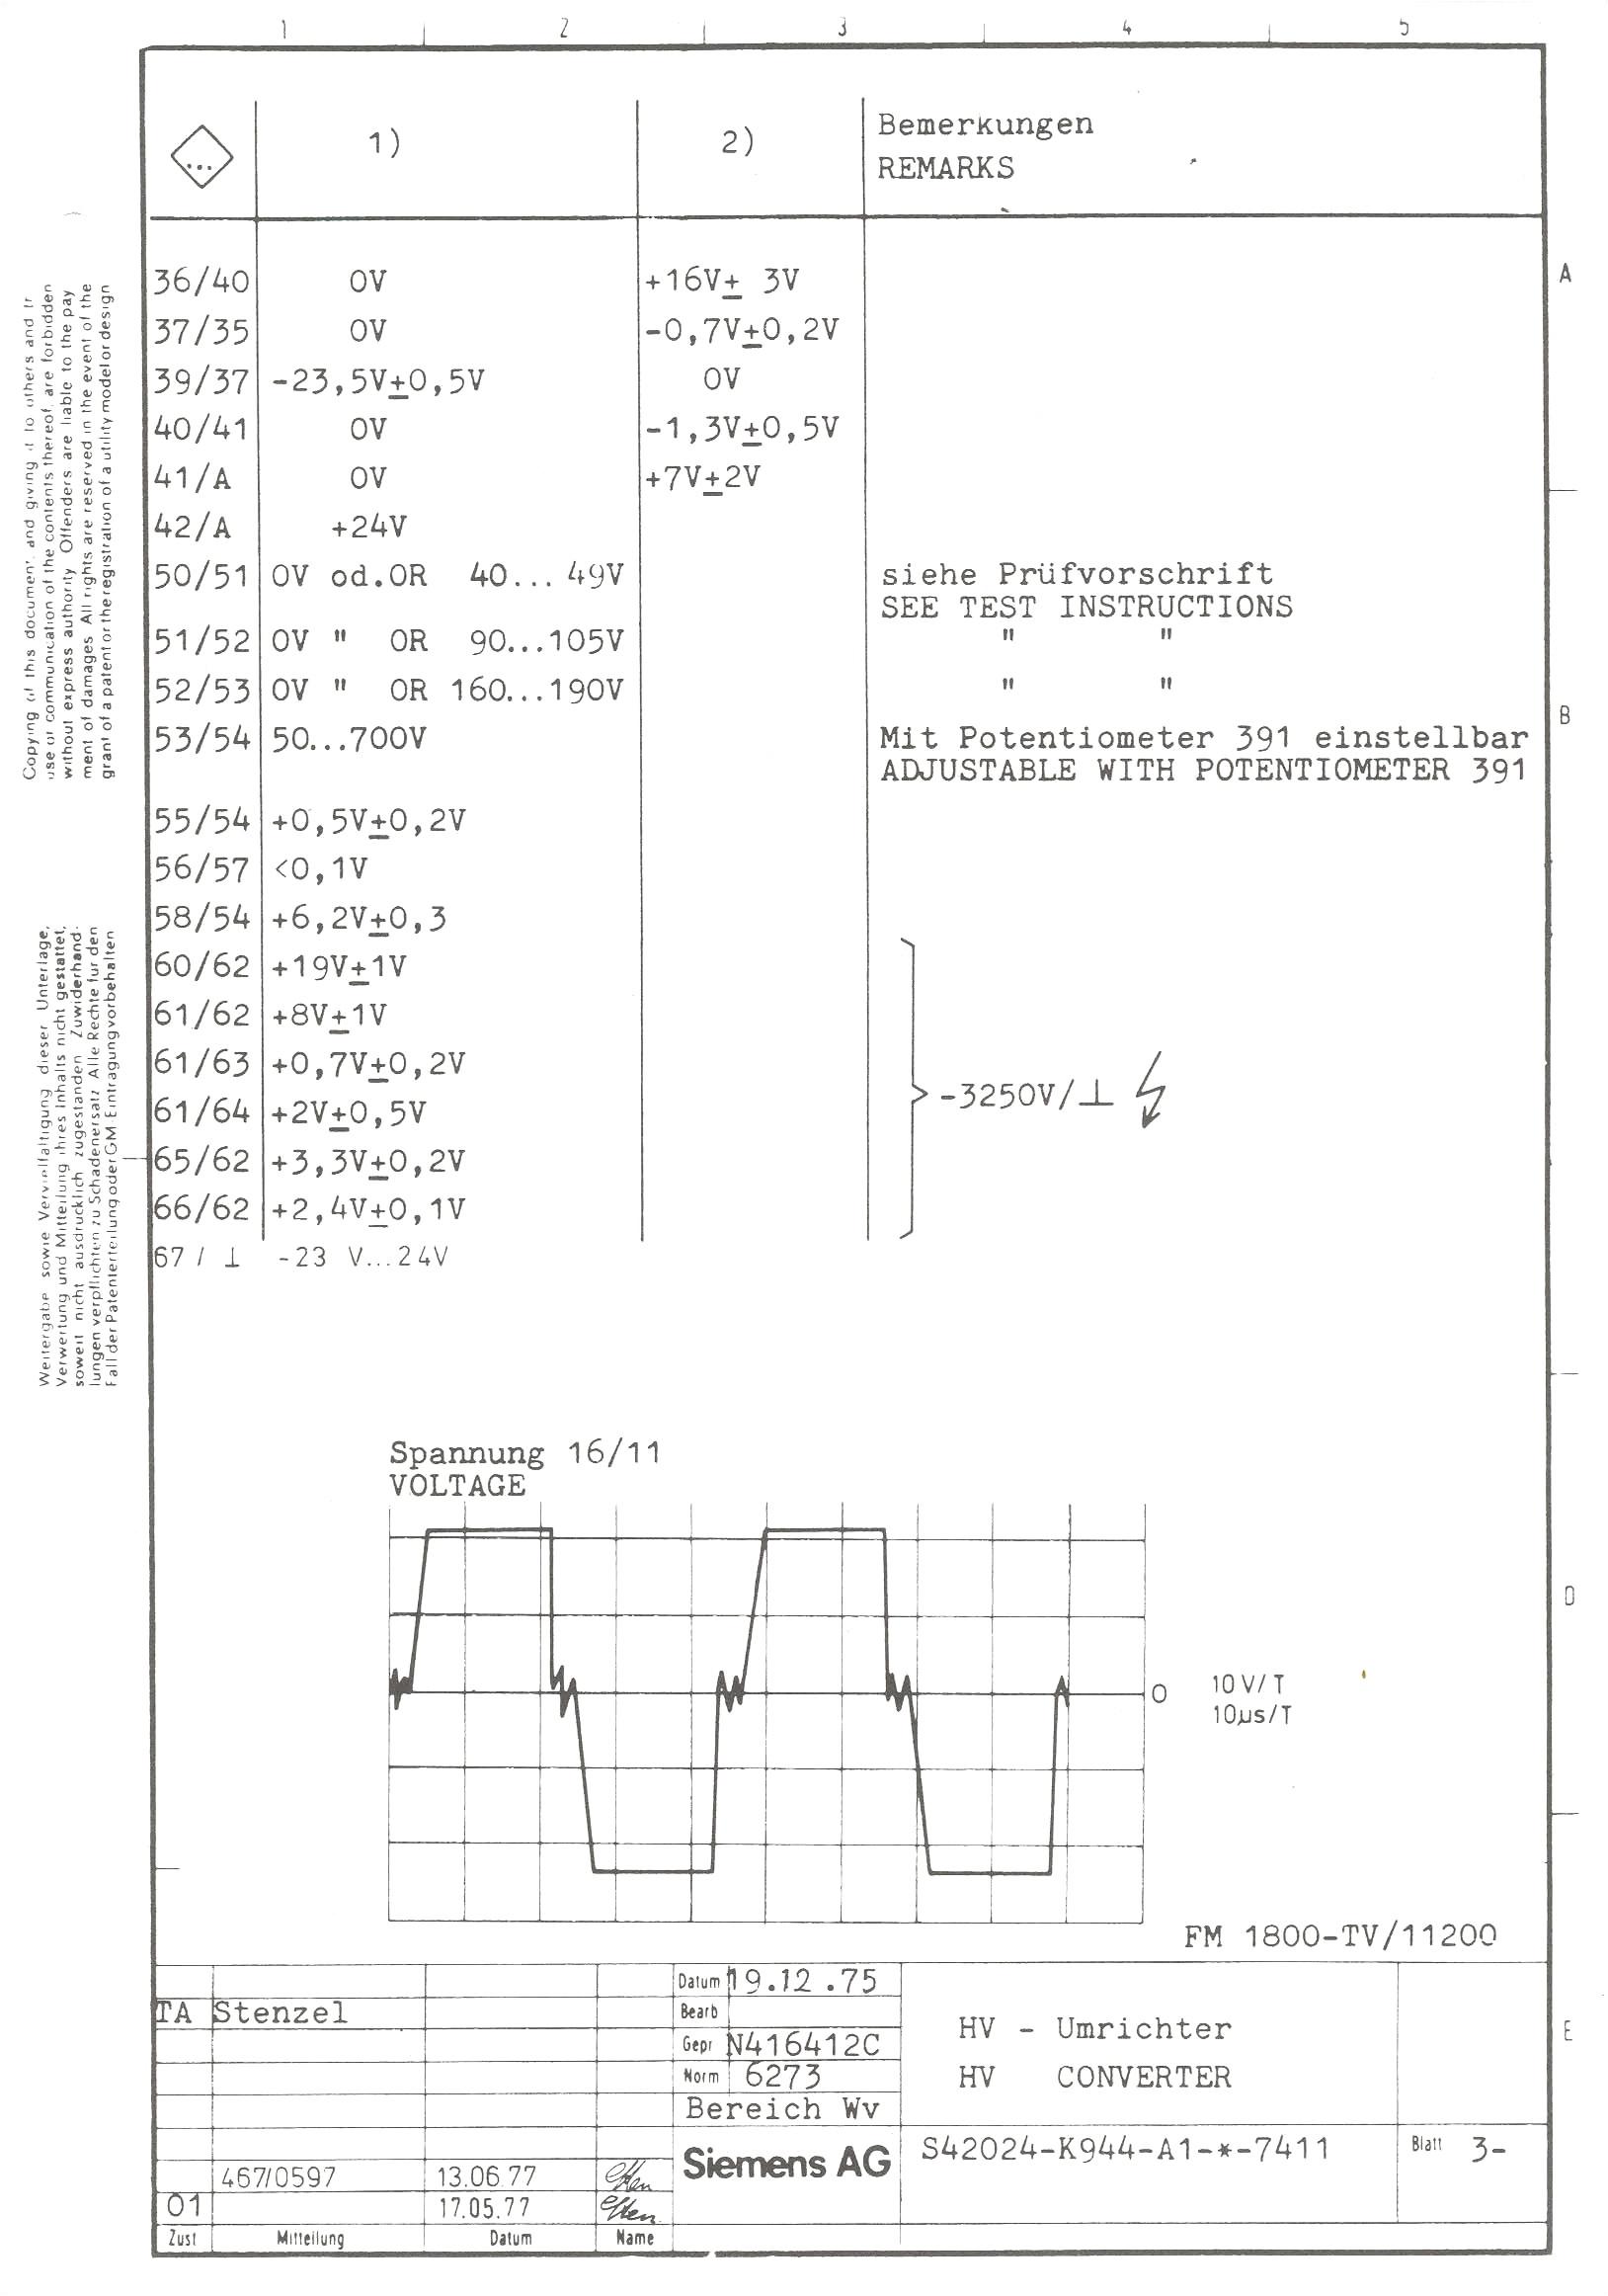 5 channel amp wiring diagram boat radio wiring wiring diagramschannel amp wiring diagram elegant wiring diagram